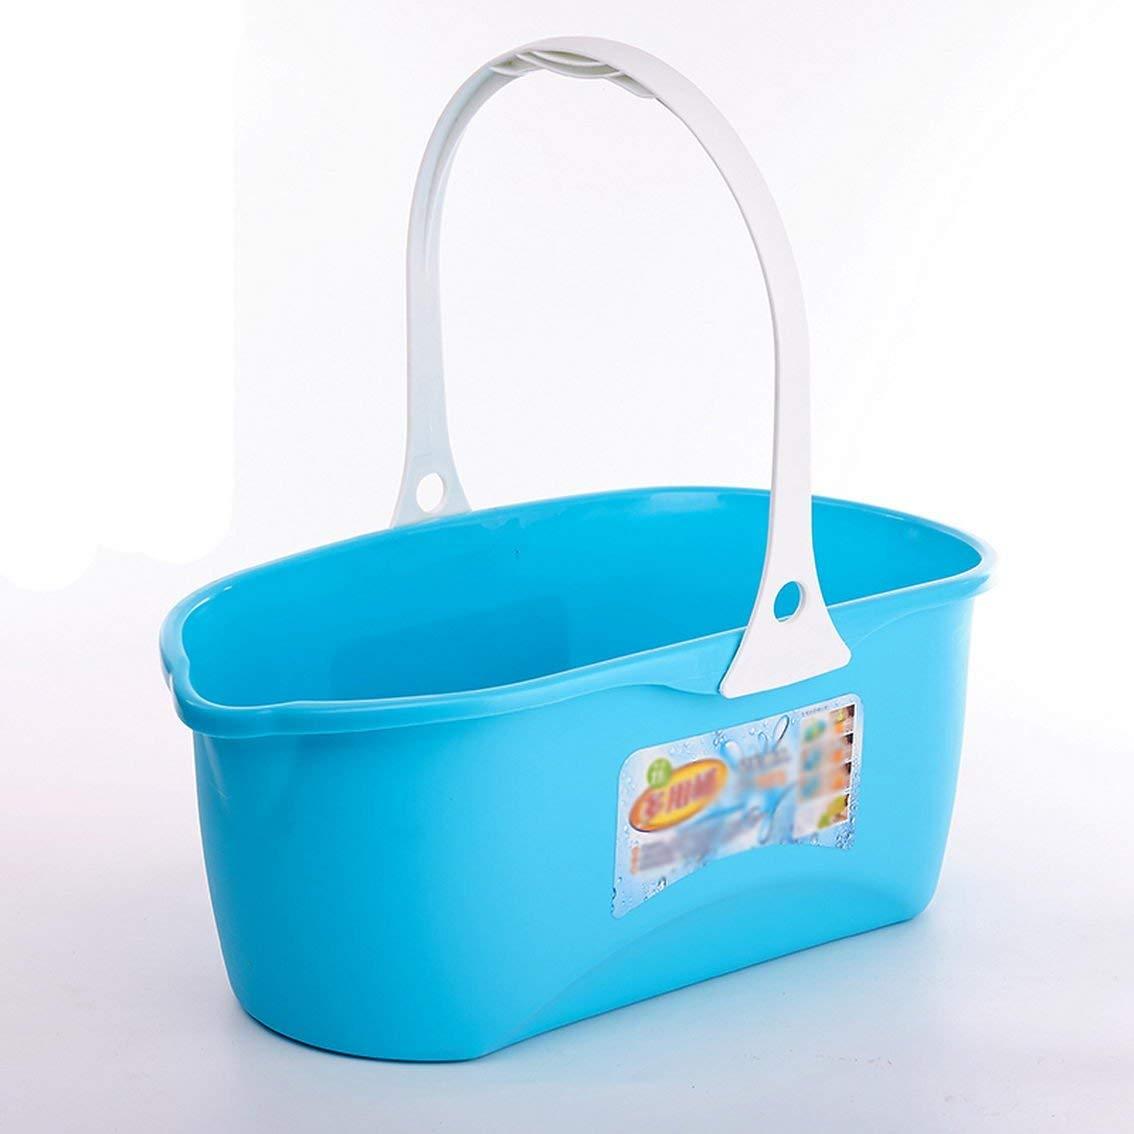 jii2030shann bucket car wash bucket portable buckets wash mop bucket mop bucket car wash bucket mop bucket mop bucket